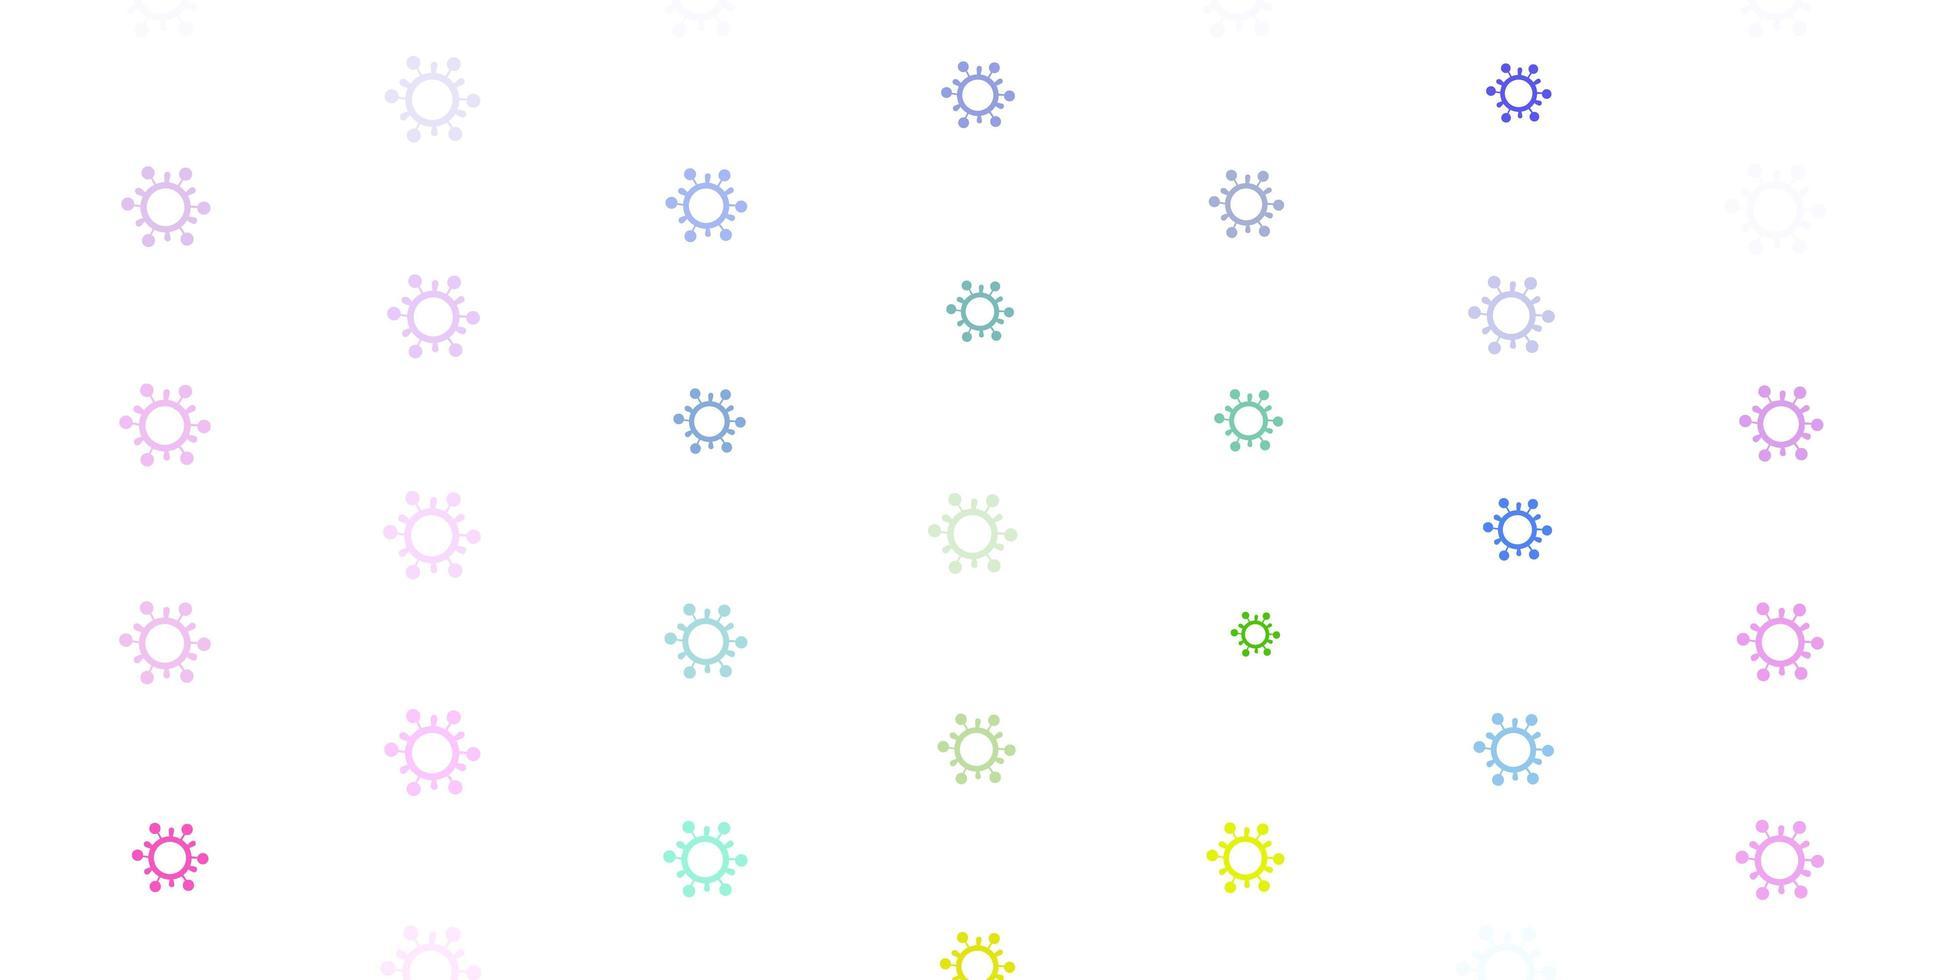 heller mehrfarbiger Vektorhintergrund mit covid-19 Symbolen vektor